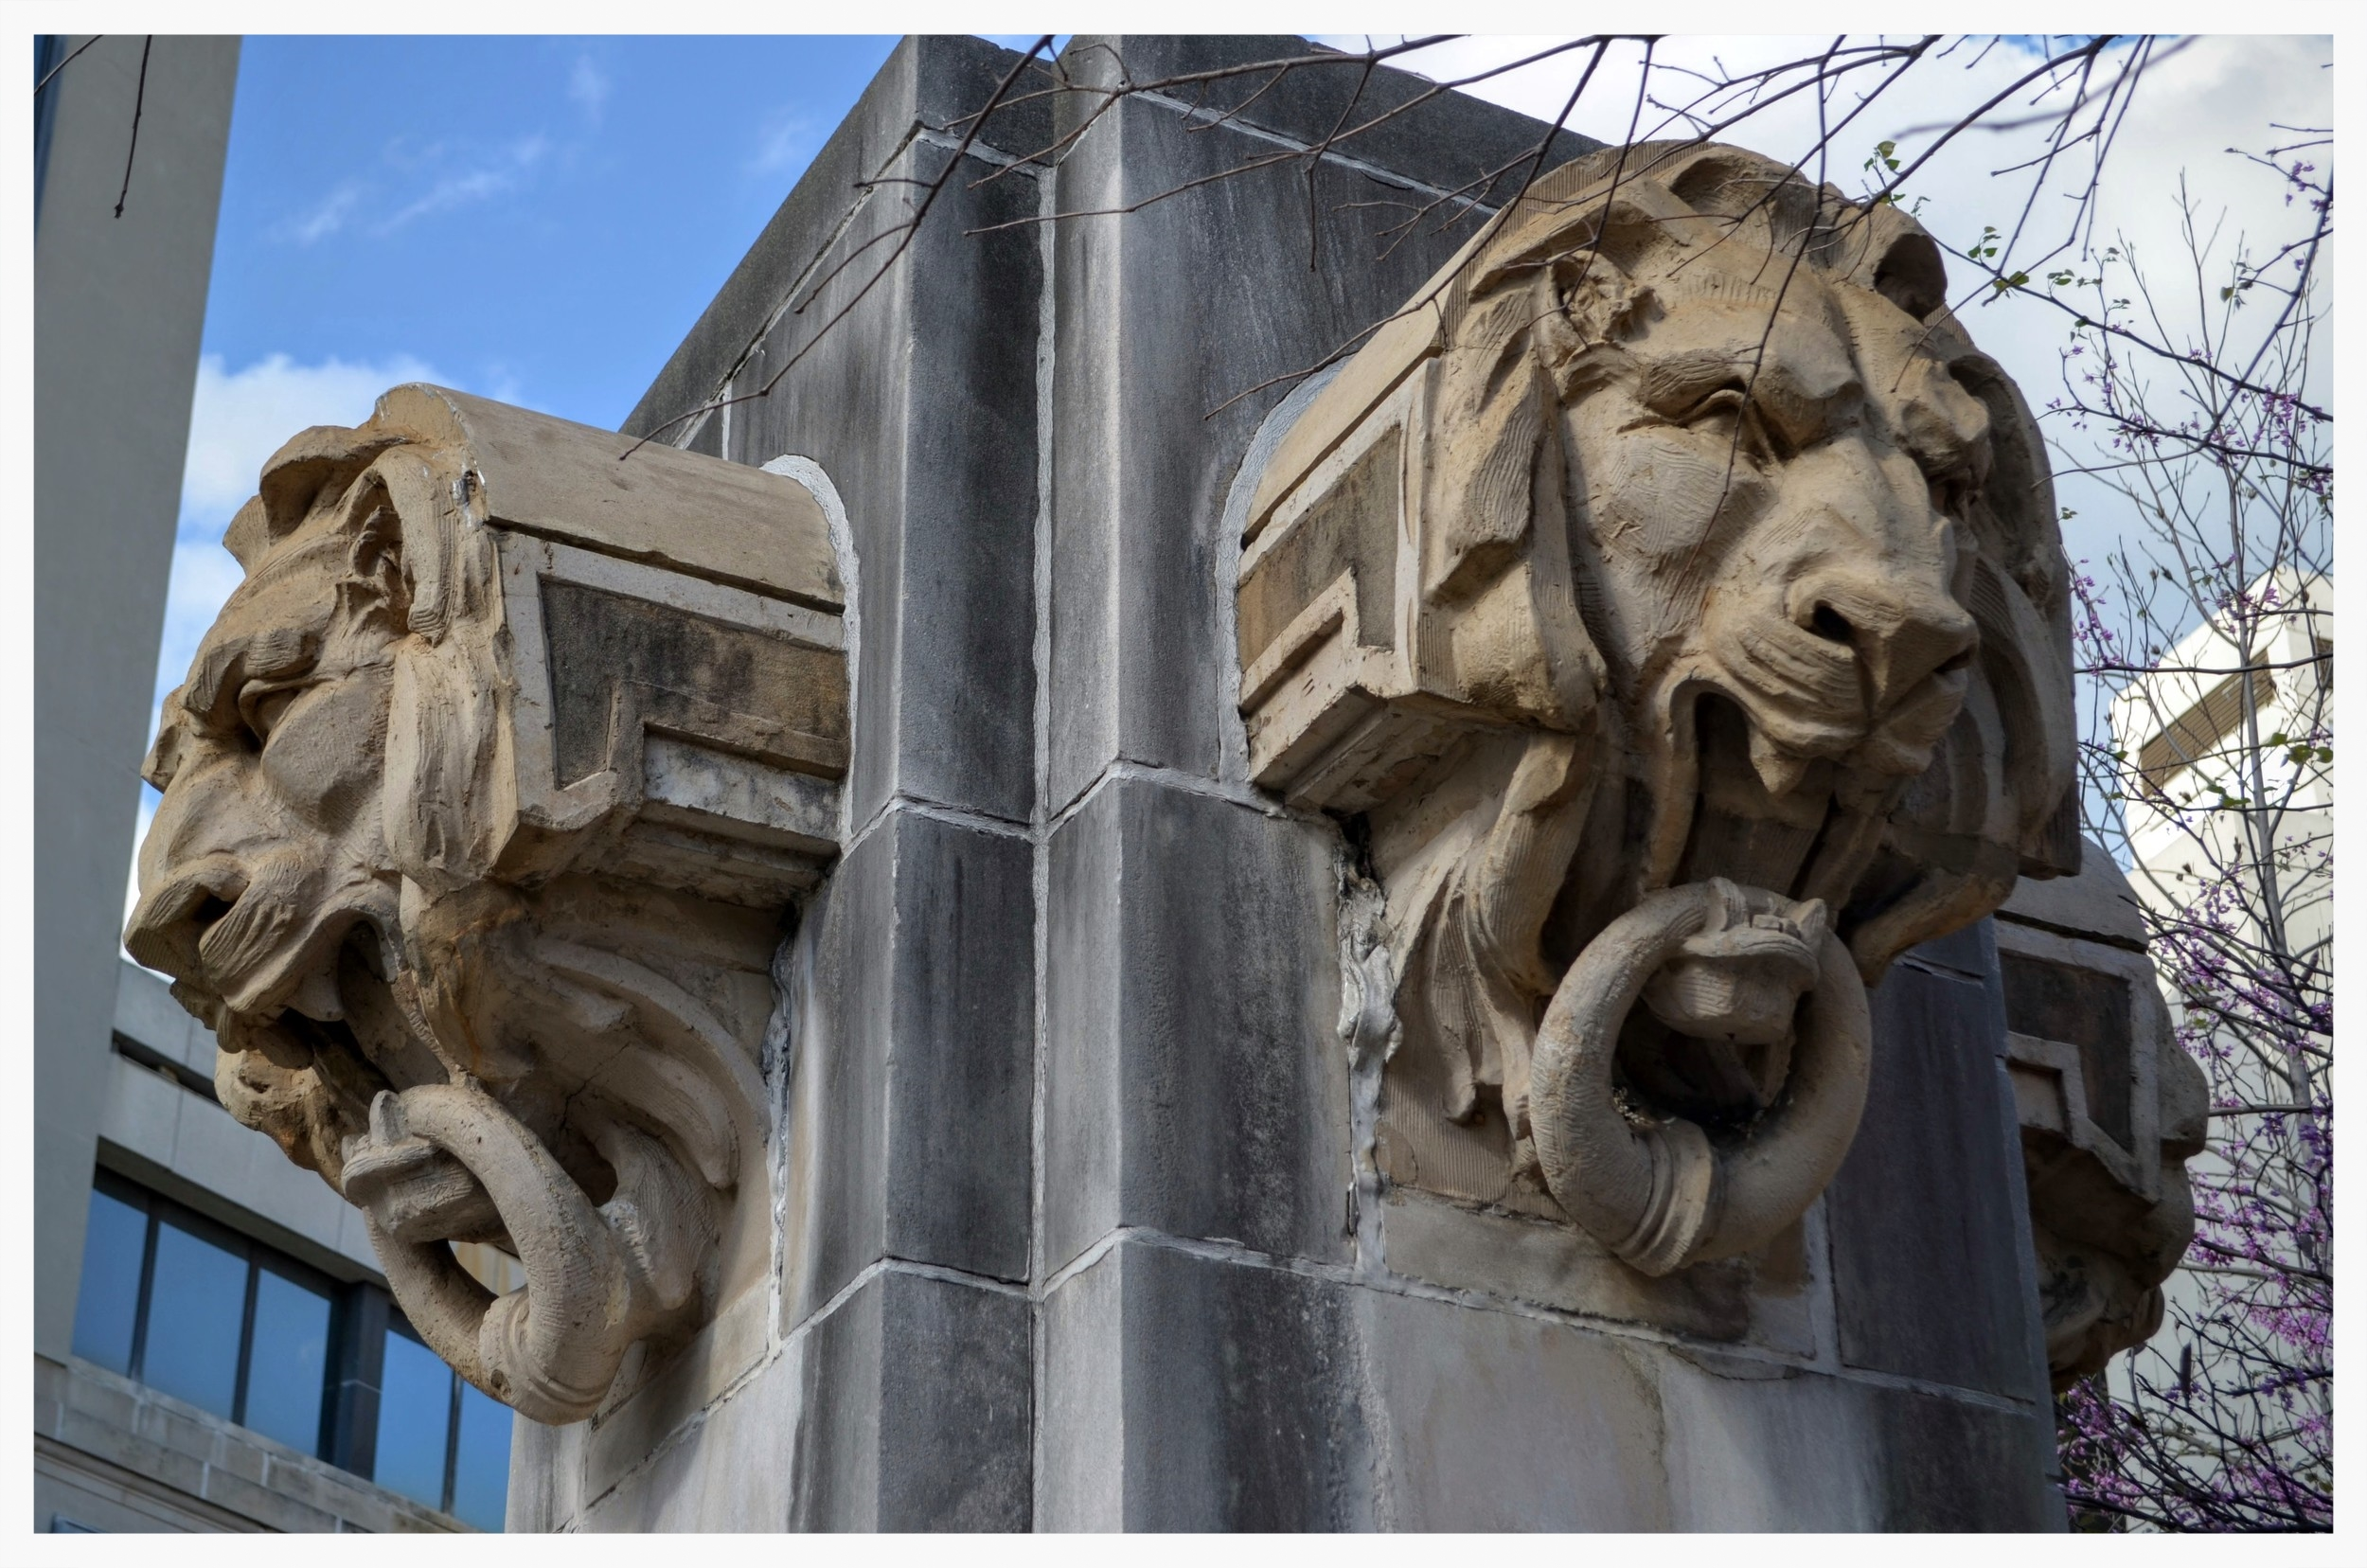 Closeup of the Decorative Lions Heads, Court Square, Montgomery, Alabama